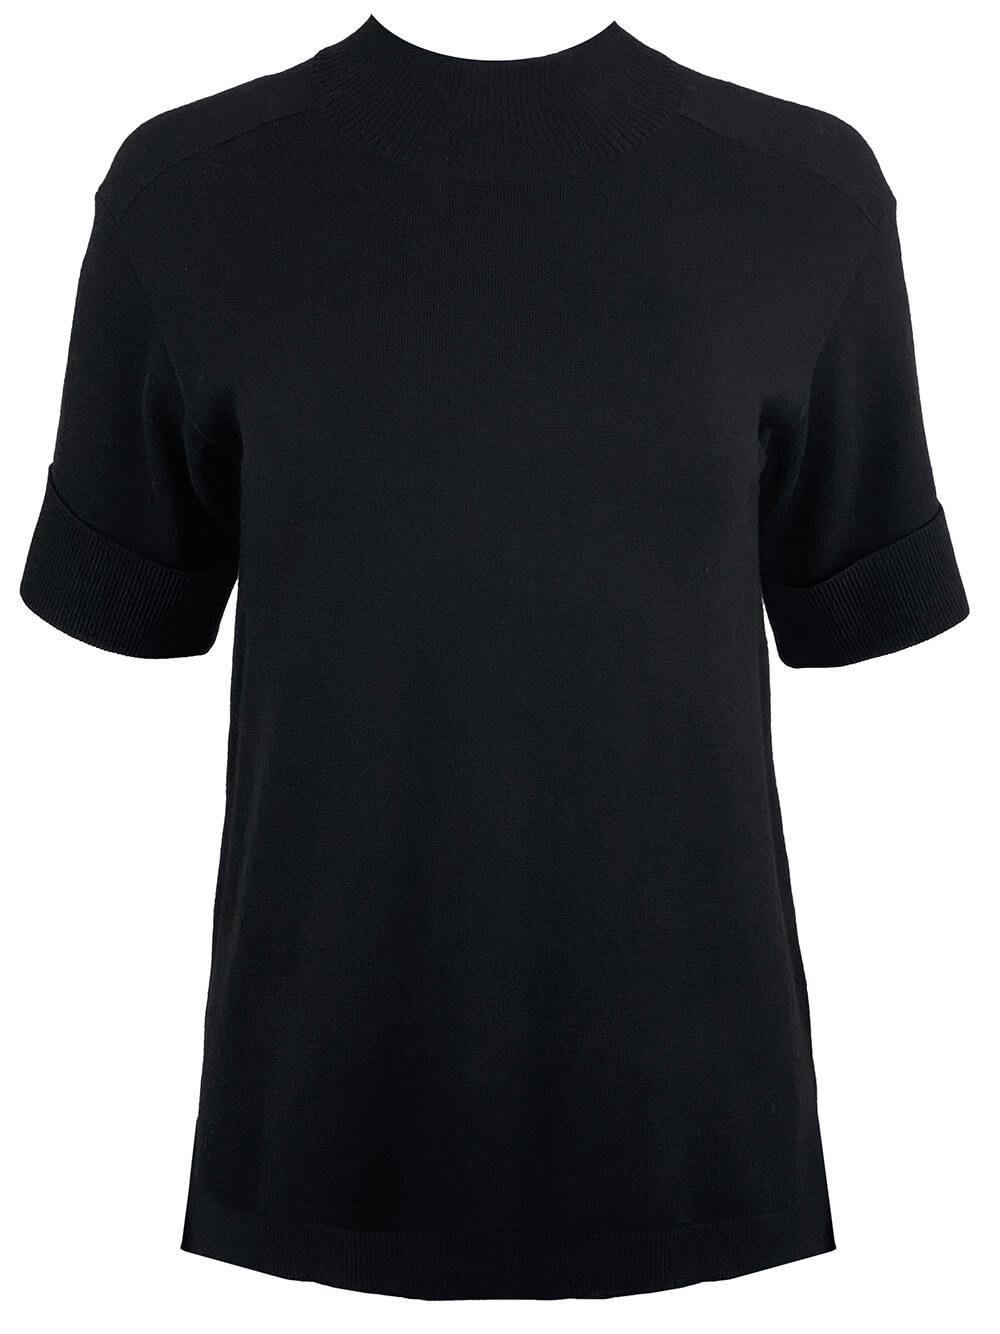 Cuff Sleeve Mock Neck Knit Top Item # 9360SW